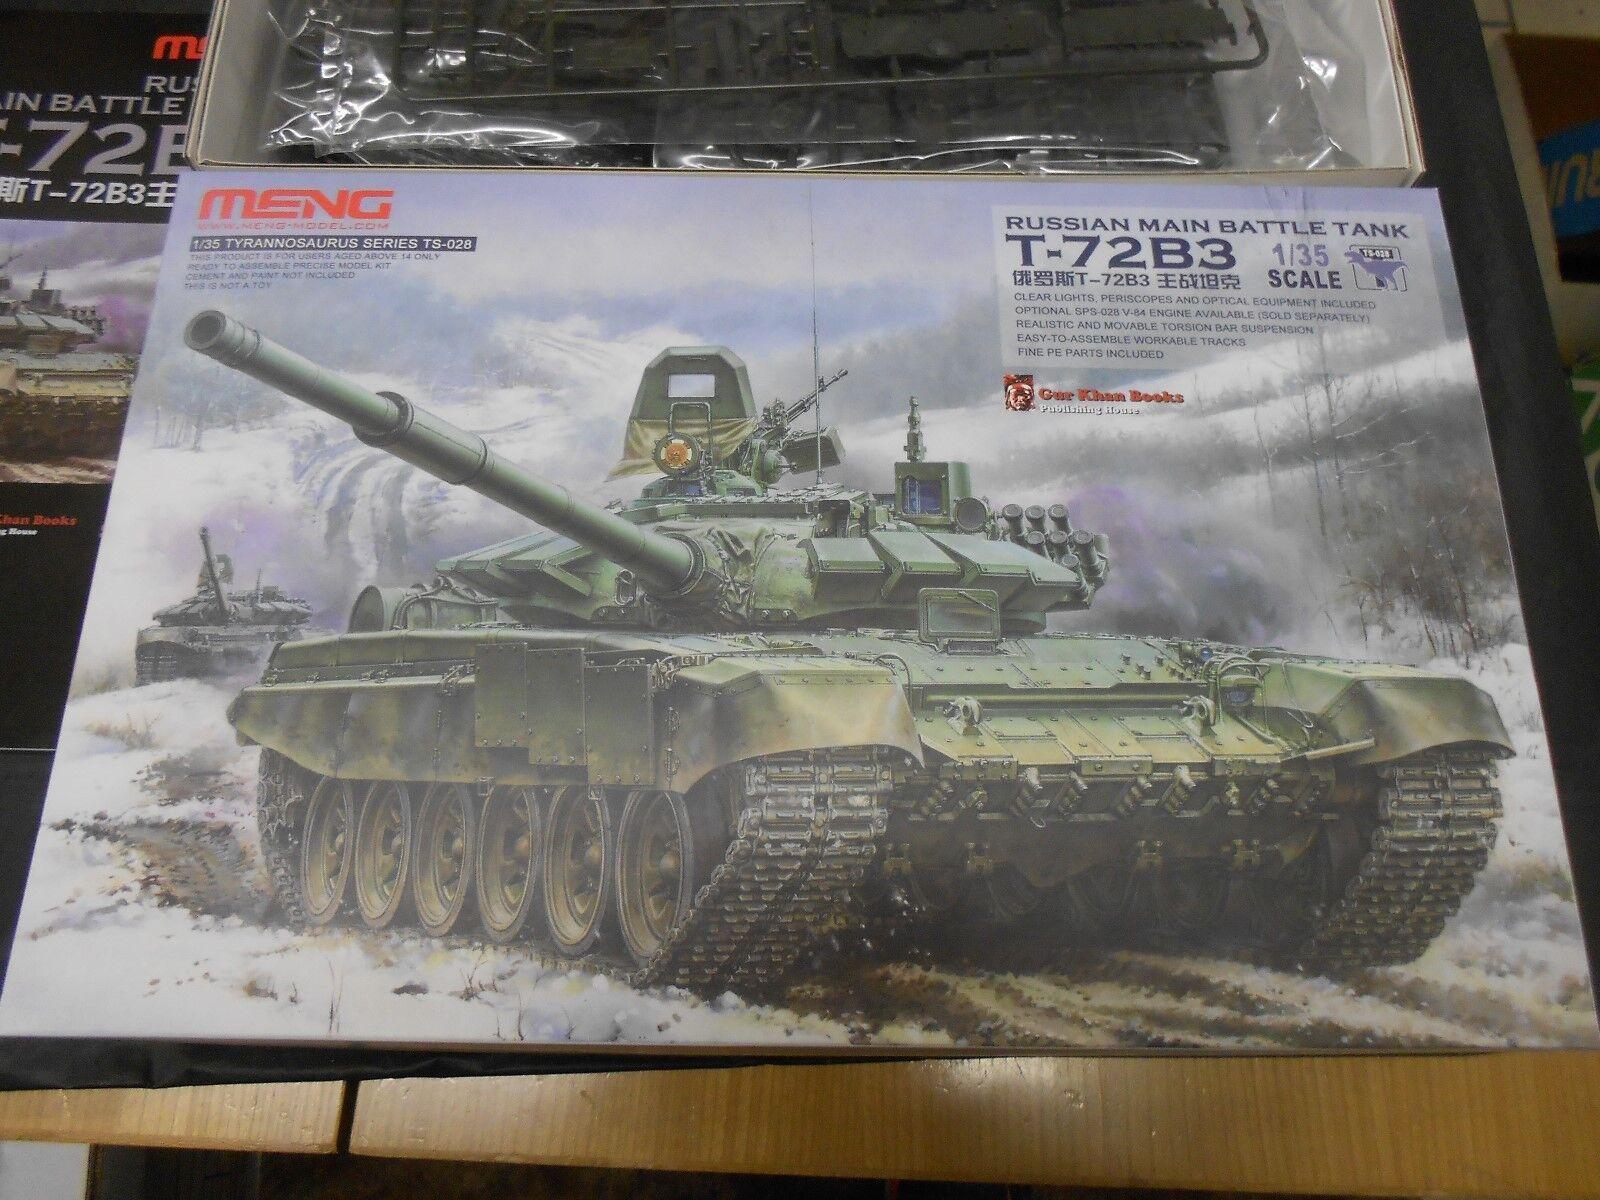 MENG TS-028 1 35 RUSSIAN MAIN BATTLE TANK T-72B3 PLASTIC MODEL KIT